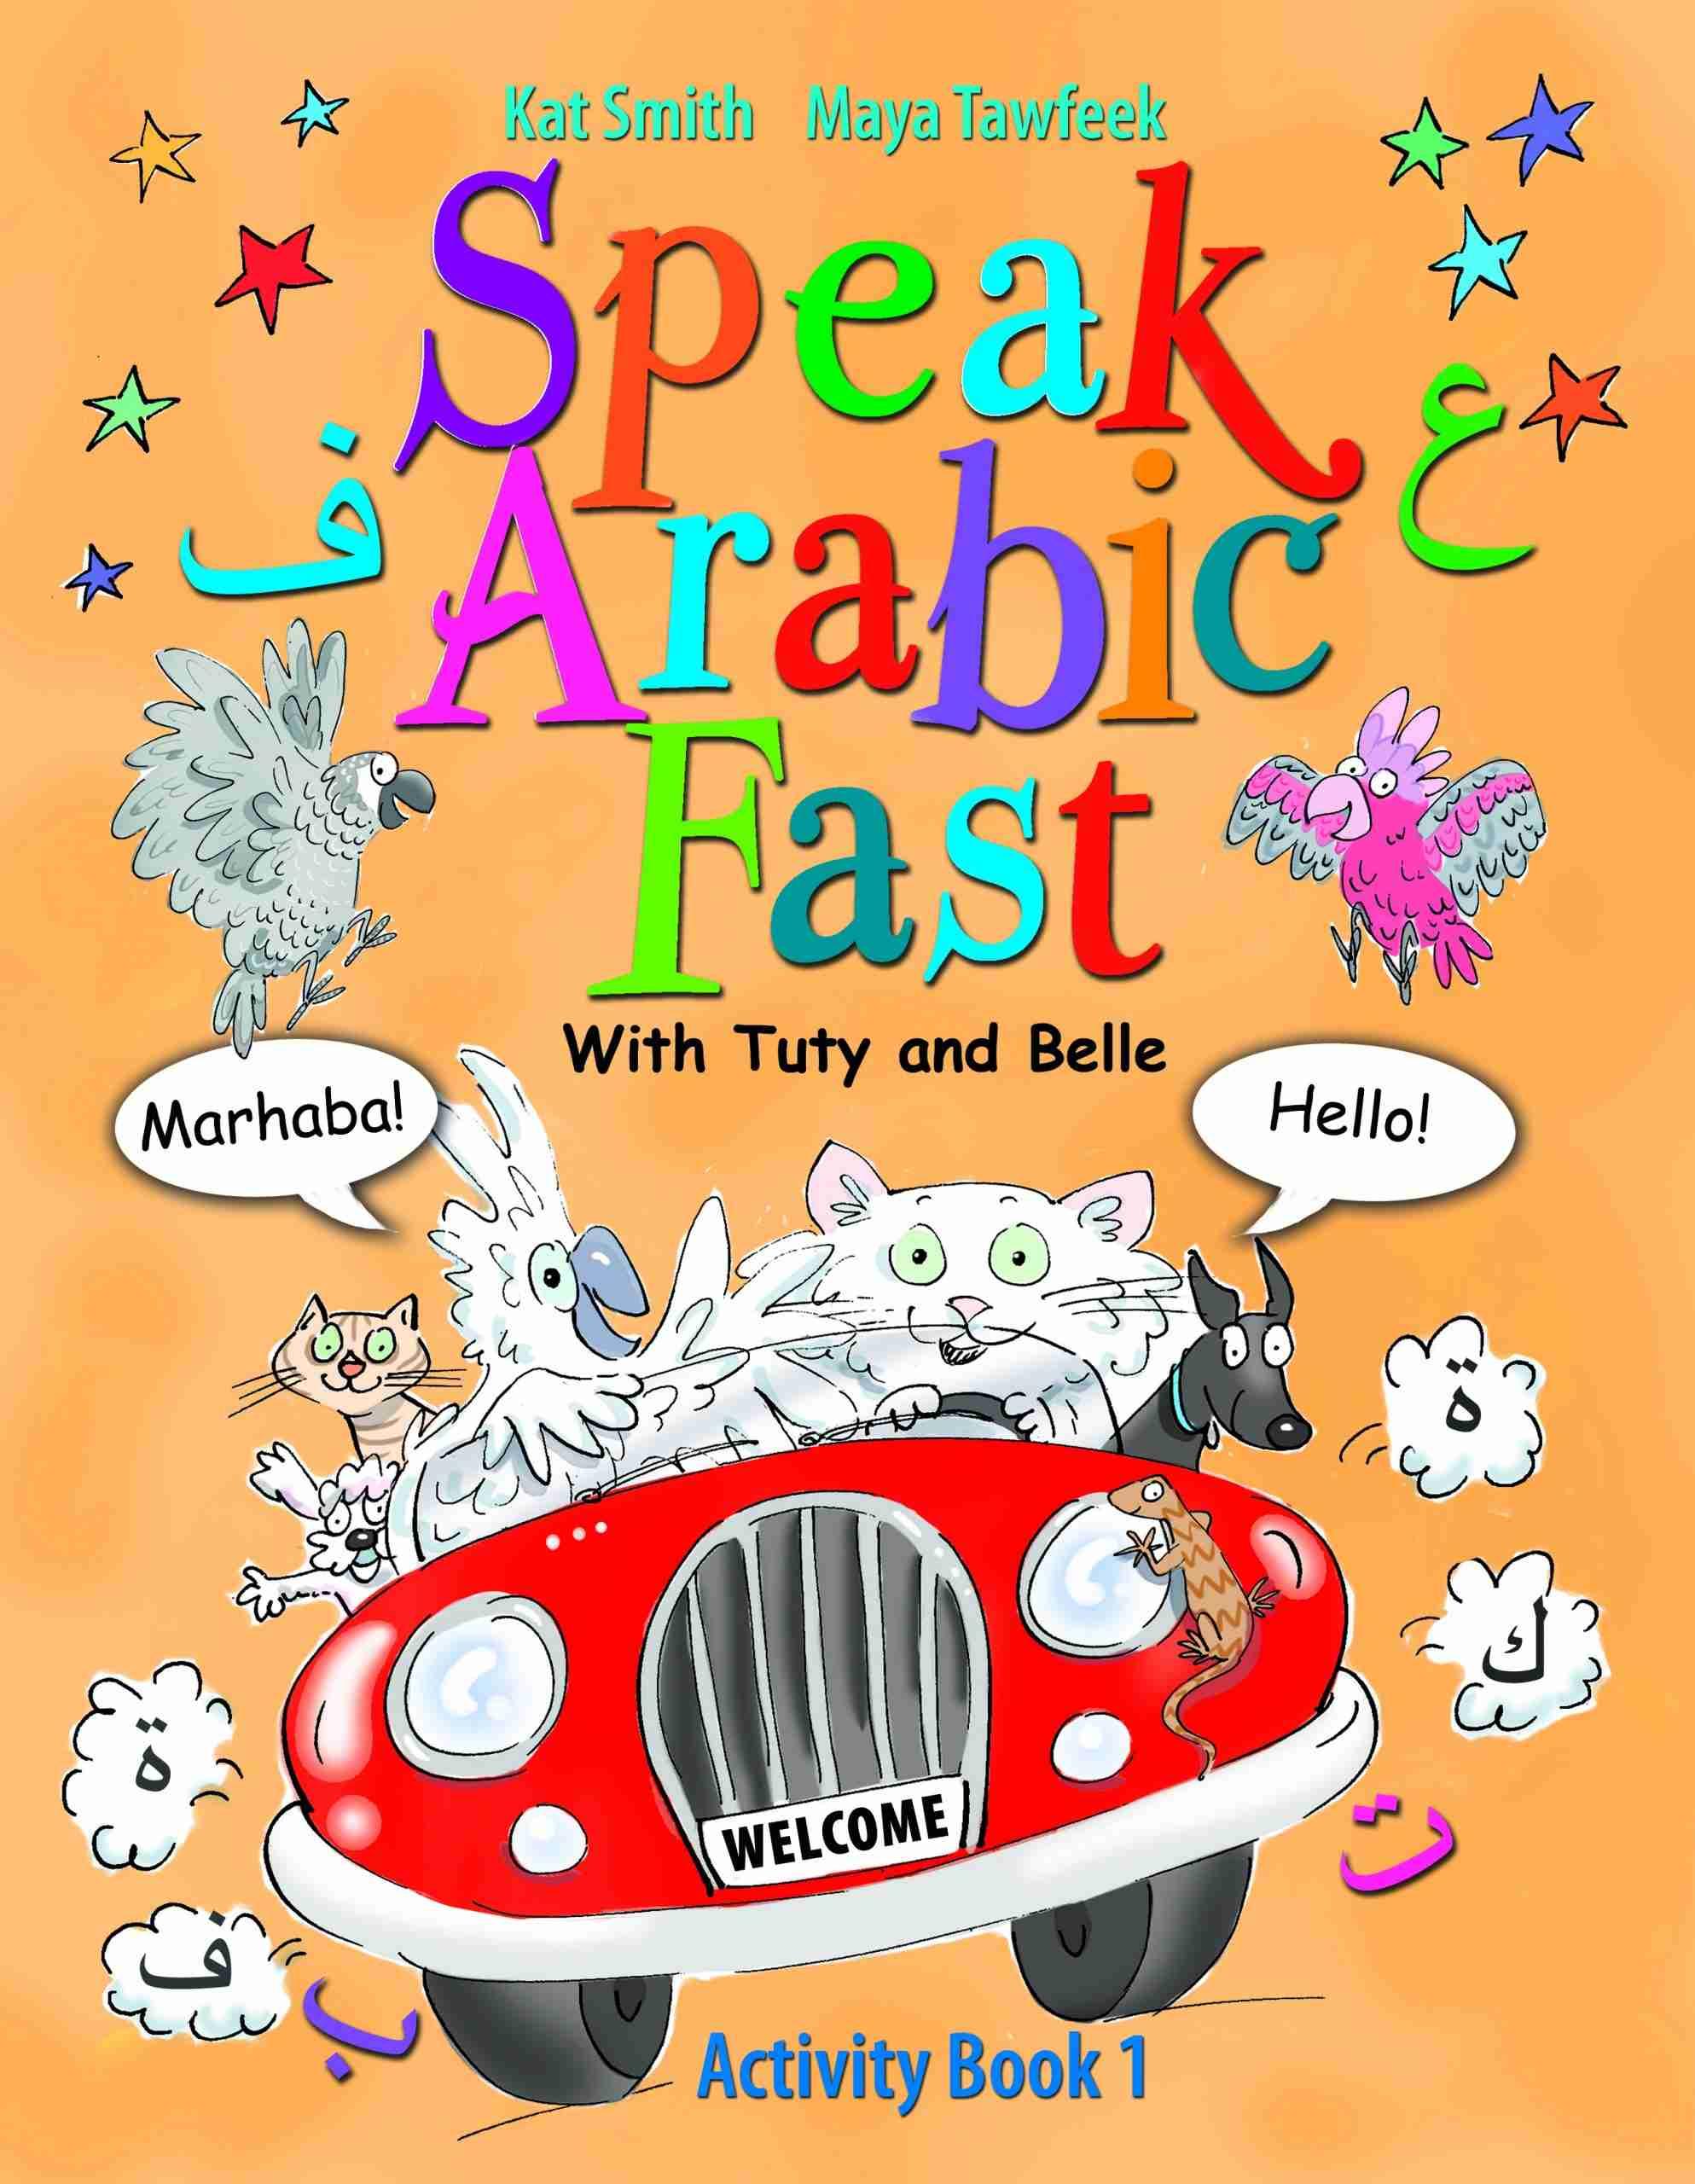 Speak Arabic Fast, Activity Book 1, by Kat Smith